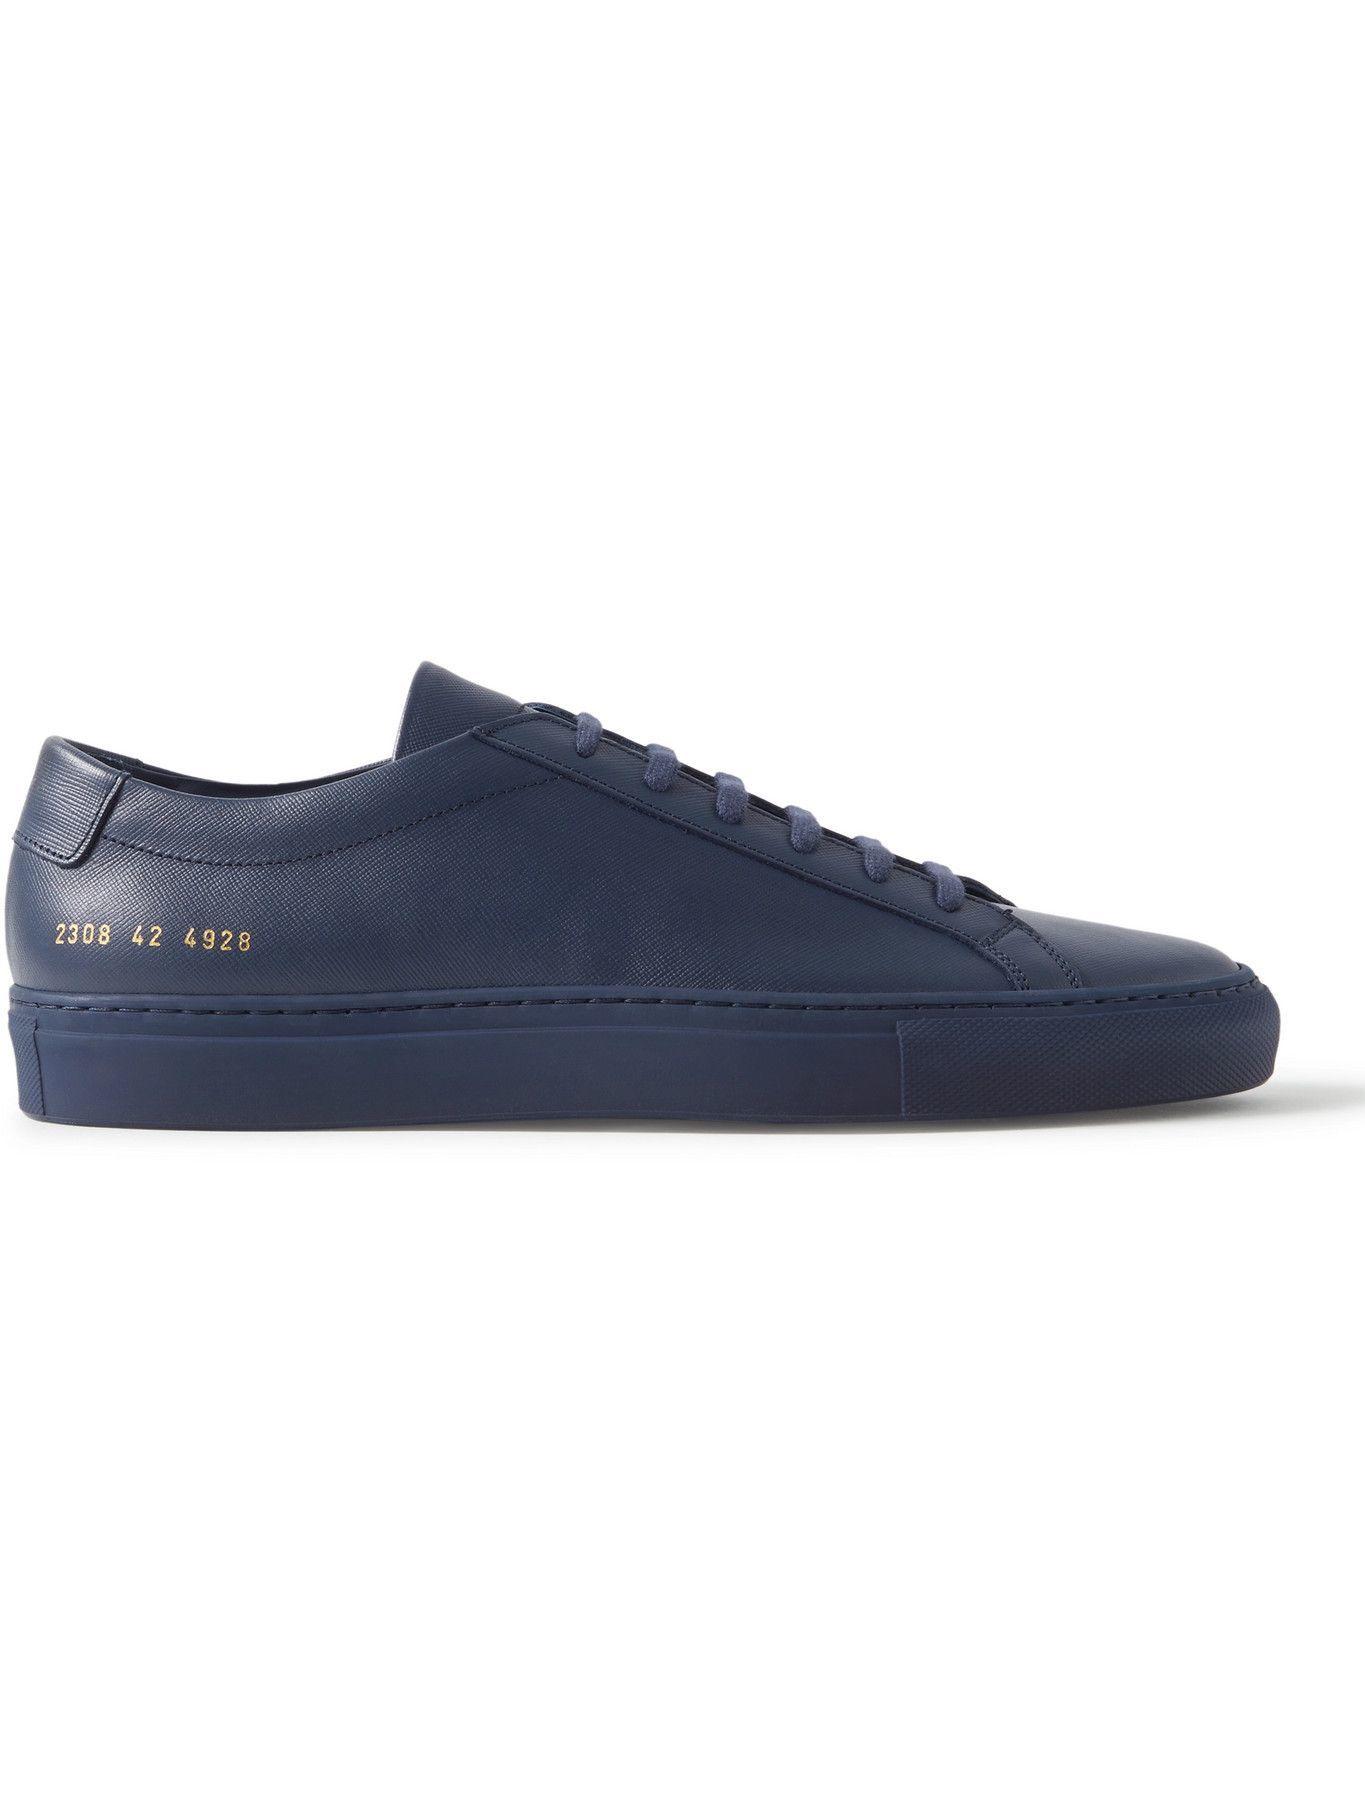 Photo: Common Projects - Original Achilles Saffiano Leather Sneakers - Blue